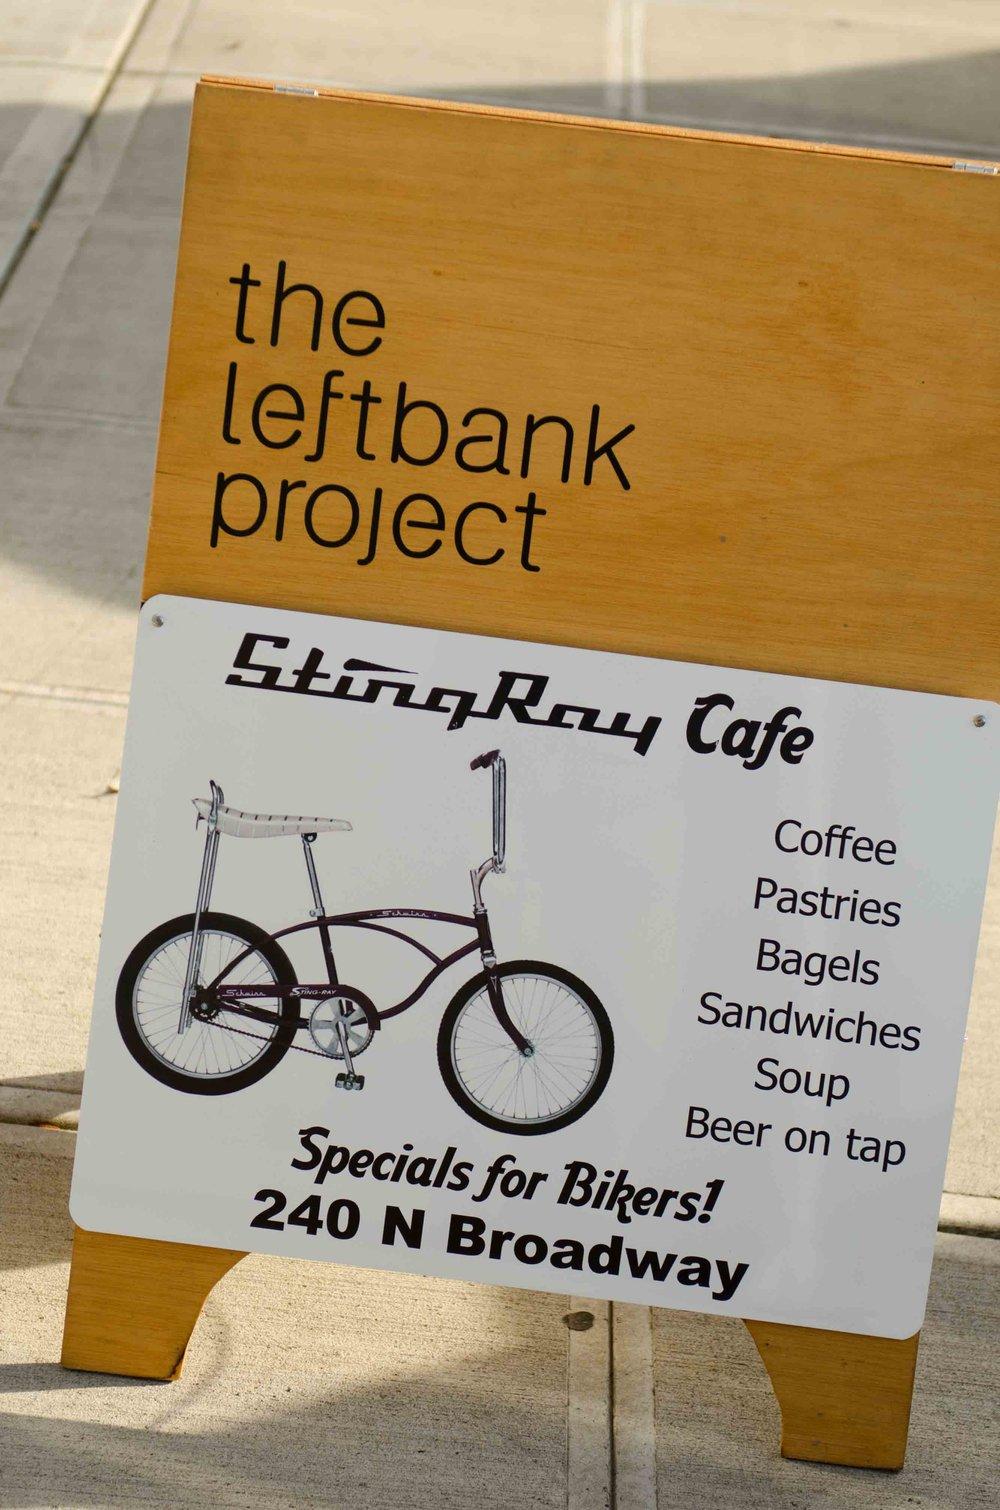 LeftbankProject-190.jpg